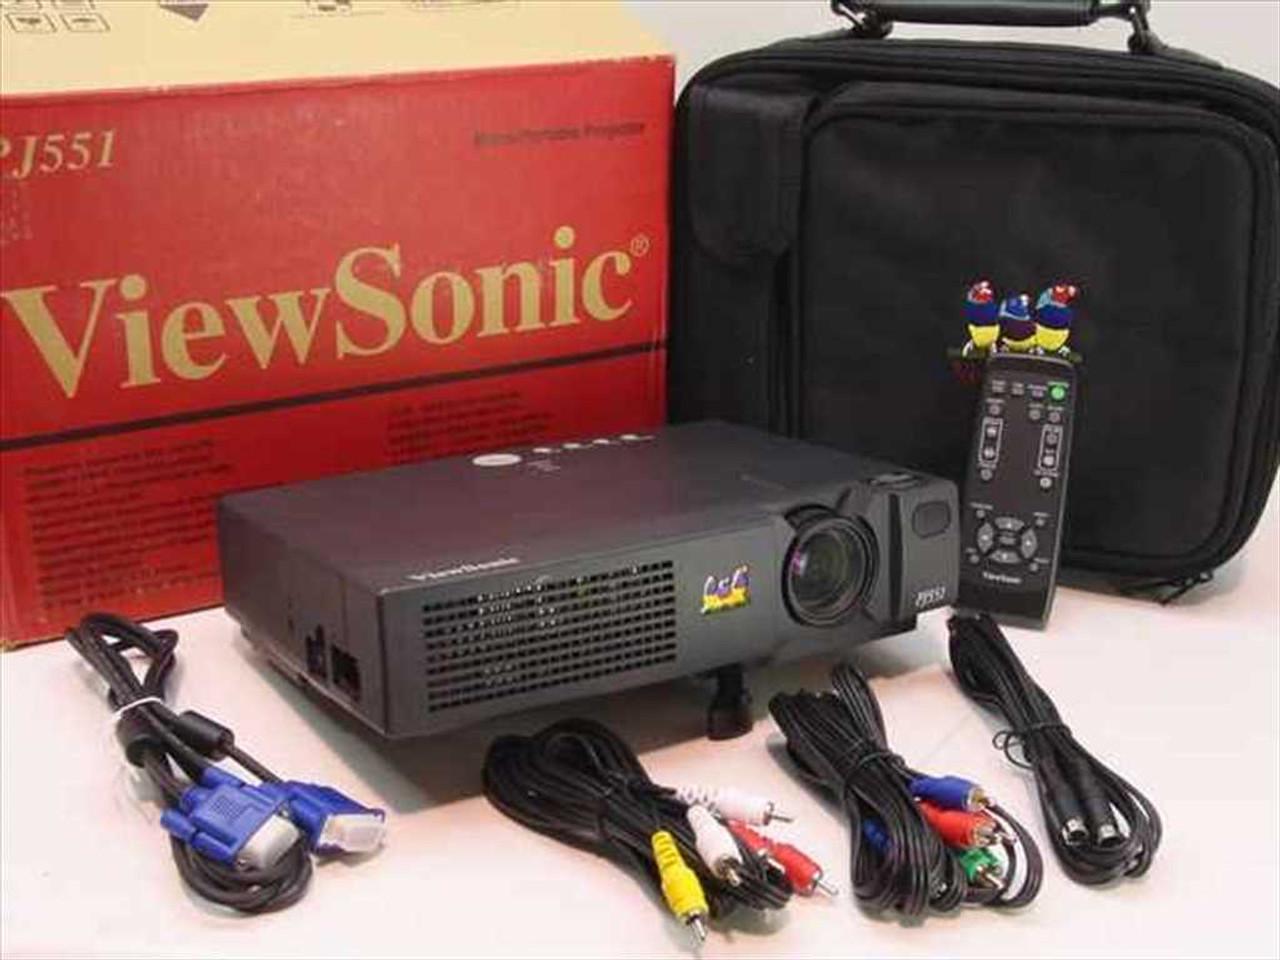 Viewsonic PJ551 LCD Projector 1024 x 768 High Resolution